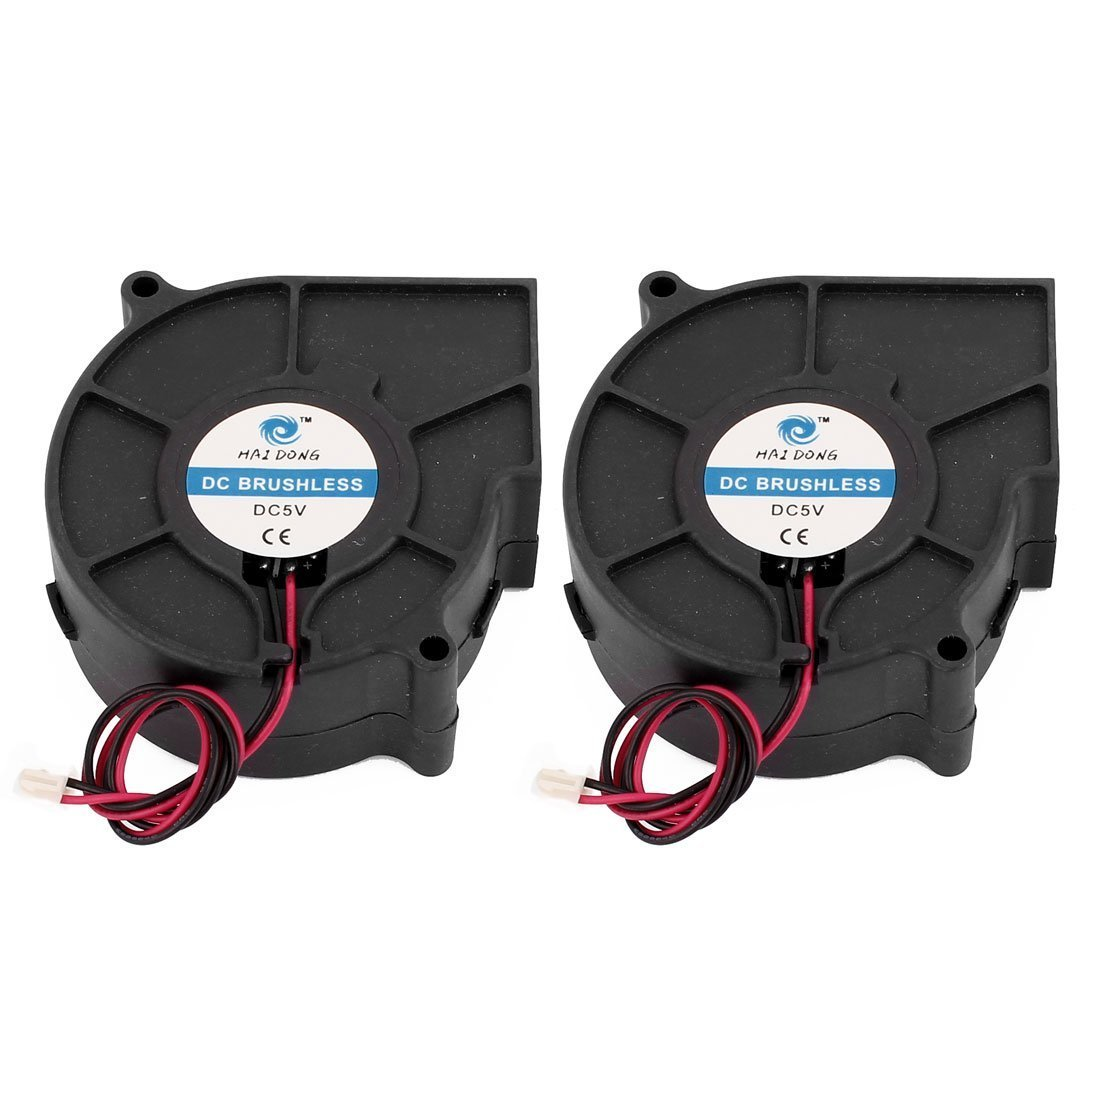 sourcingmap® 2x DC12V 75x75x30mm Bürstenlos Turbo Gebläse Kühlung Ventilator für PC Gehäuse a16032500ux0920